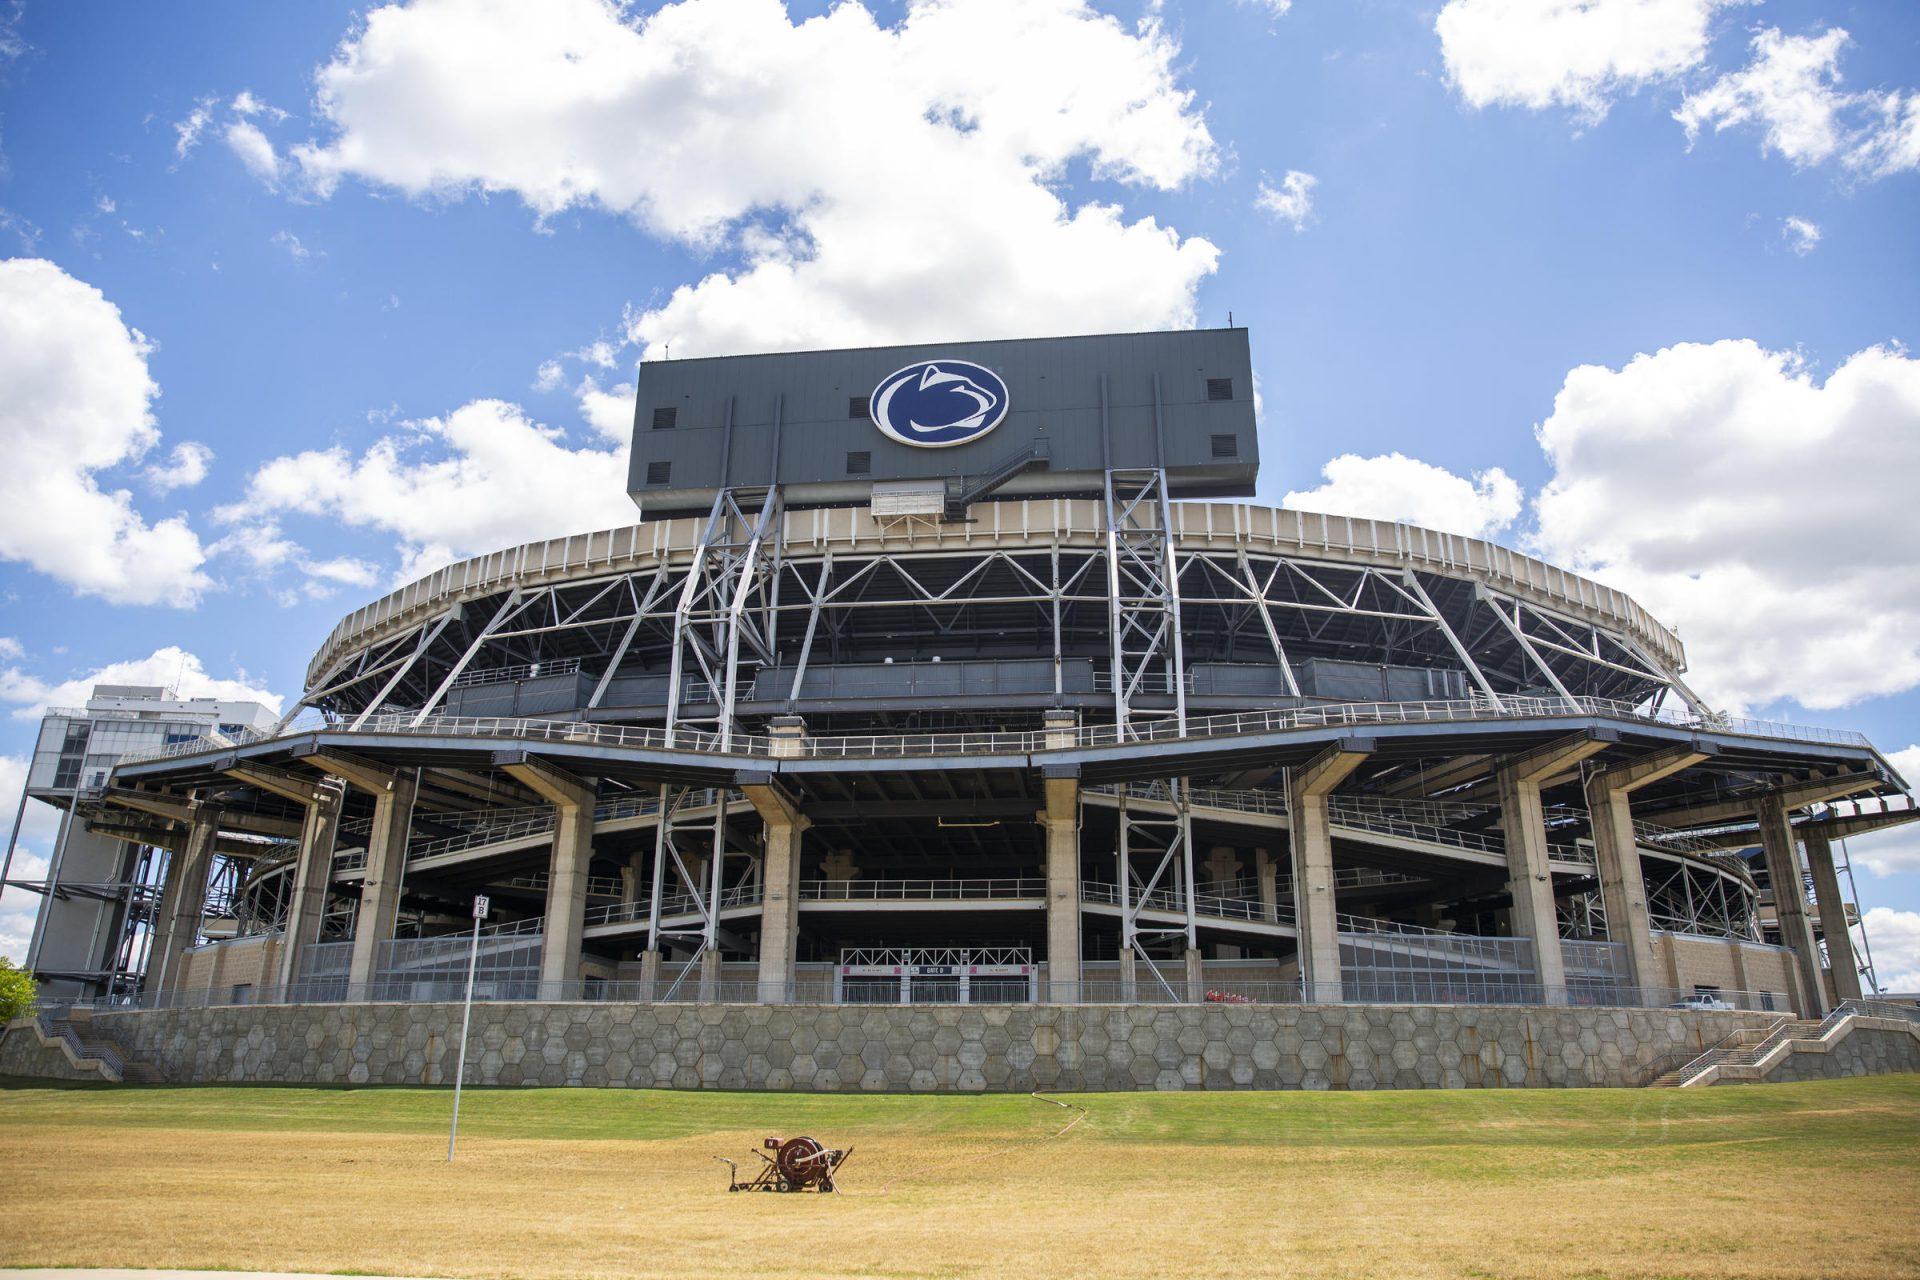 Beaver Stadium at Penn State's University Park campus in July 2020.